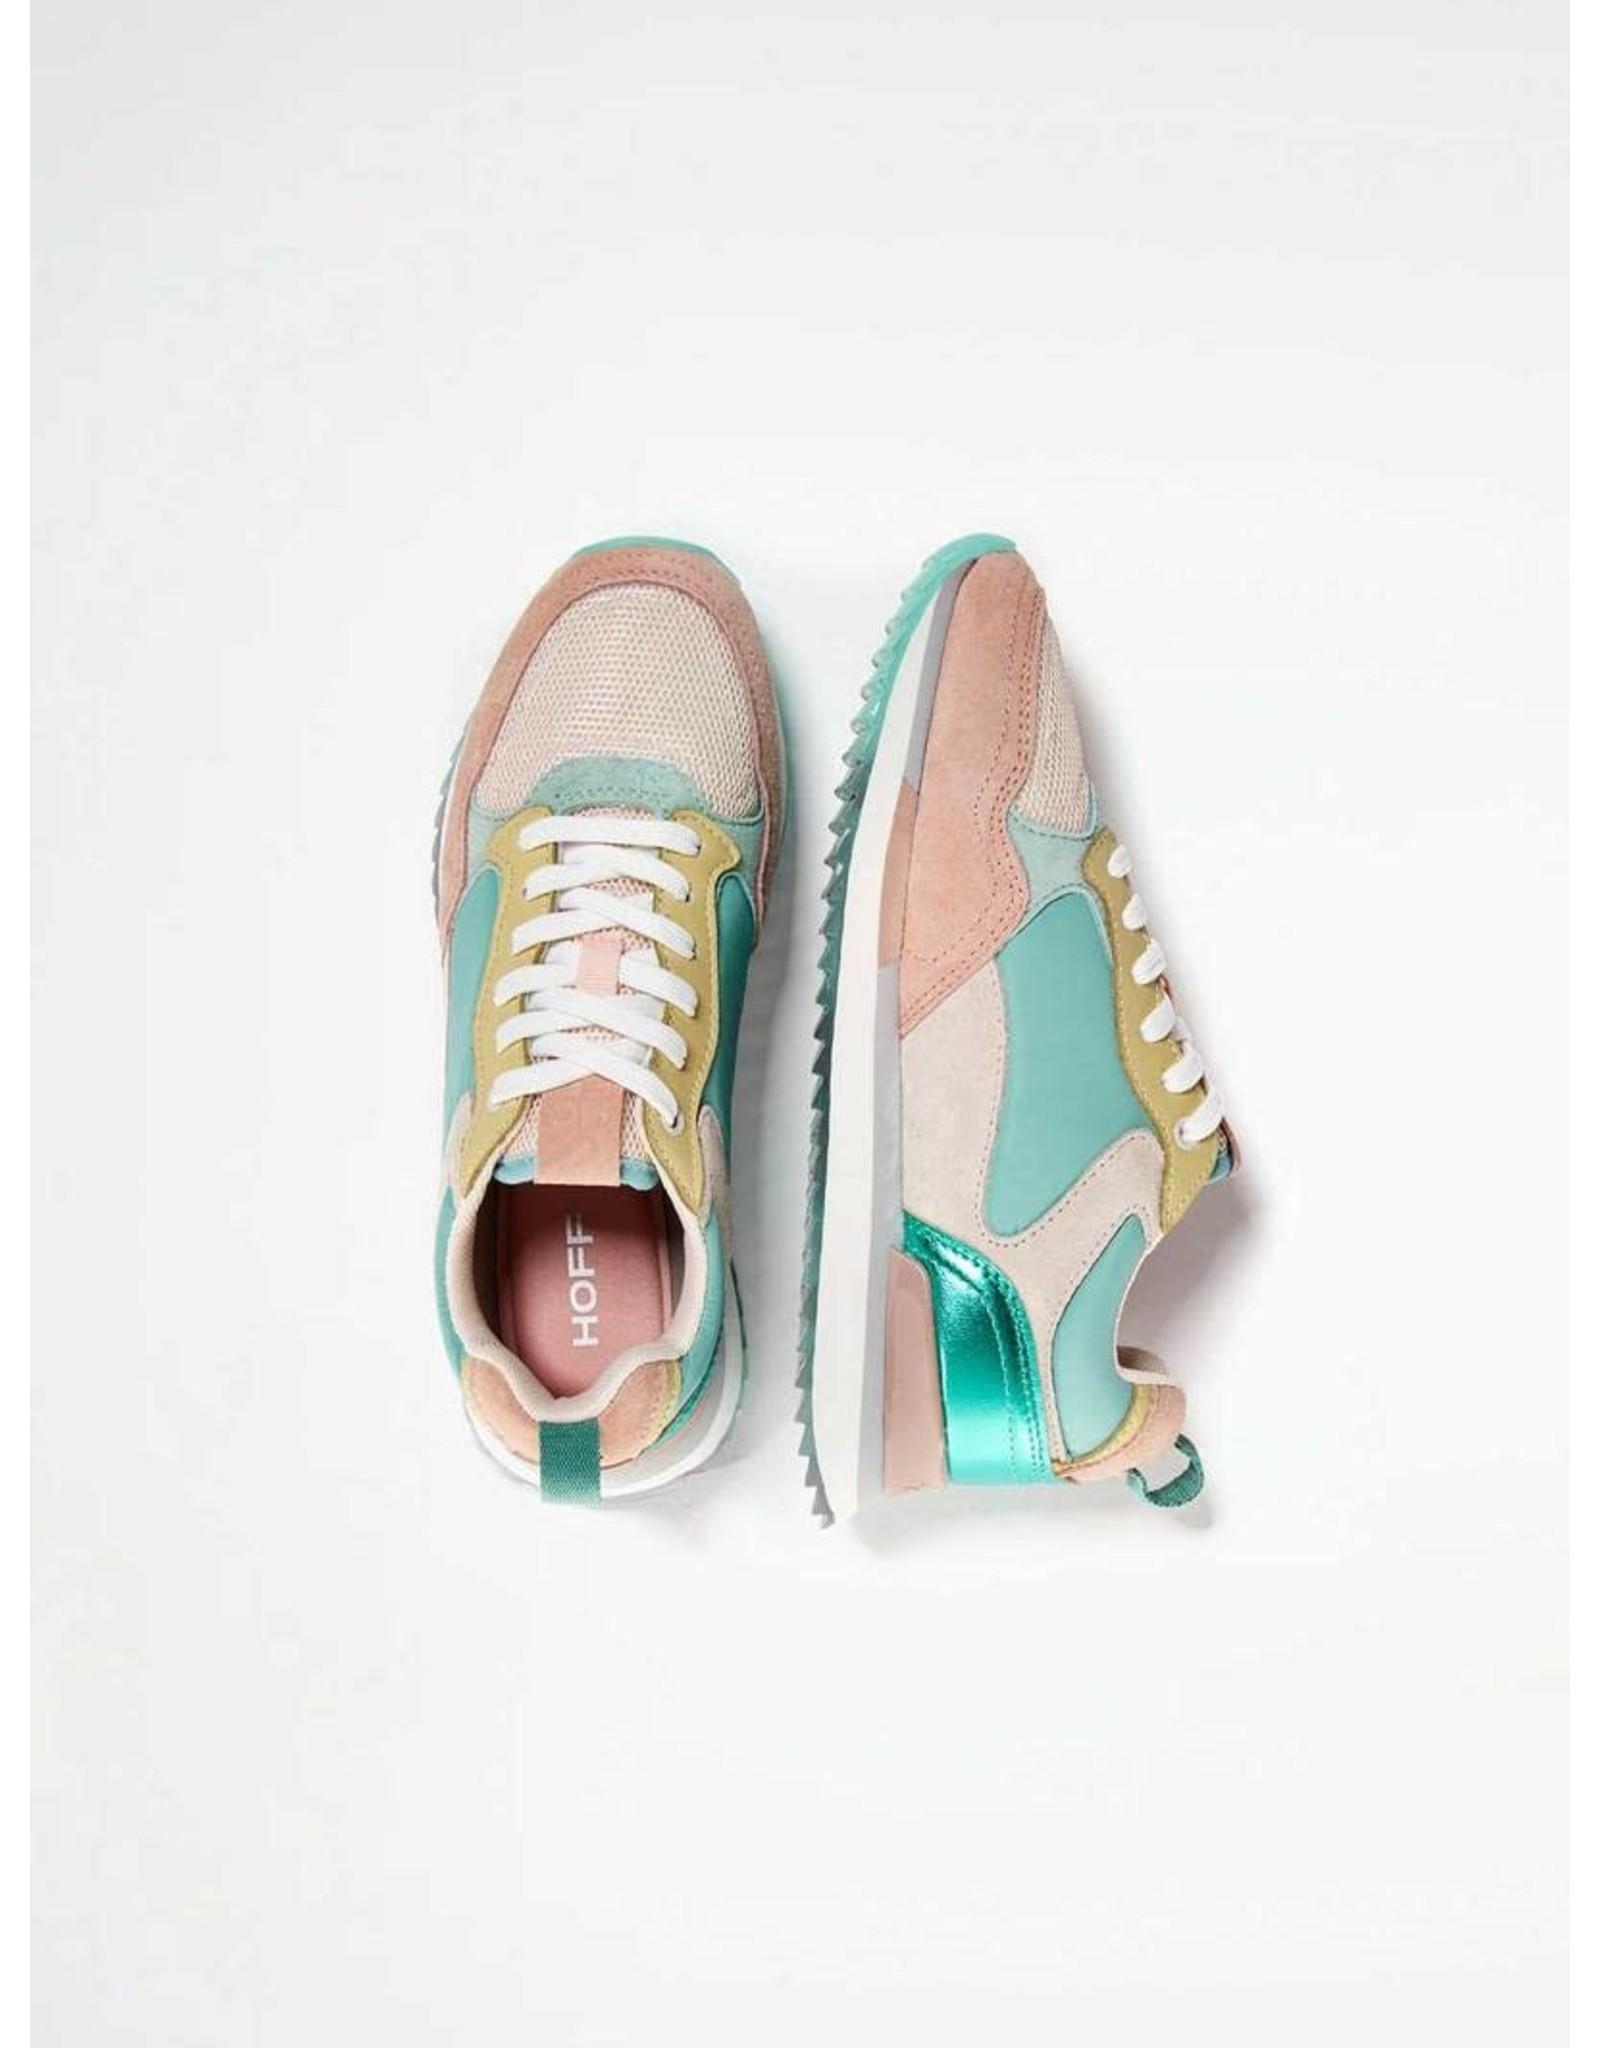 HOFF Singapore Sneaker